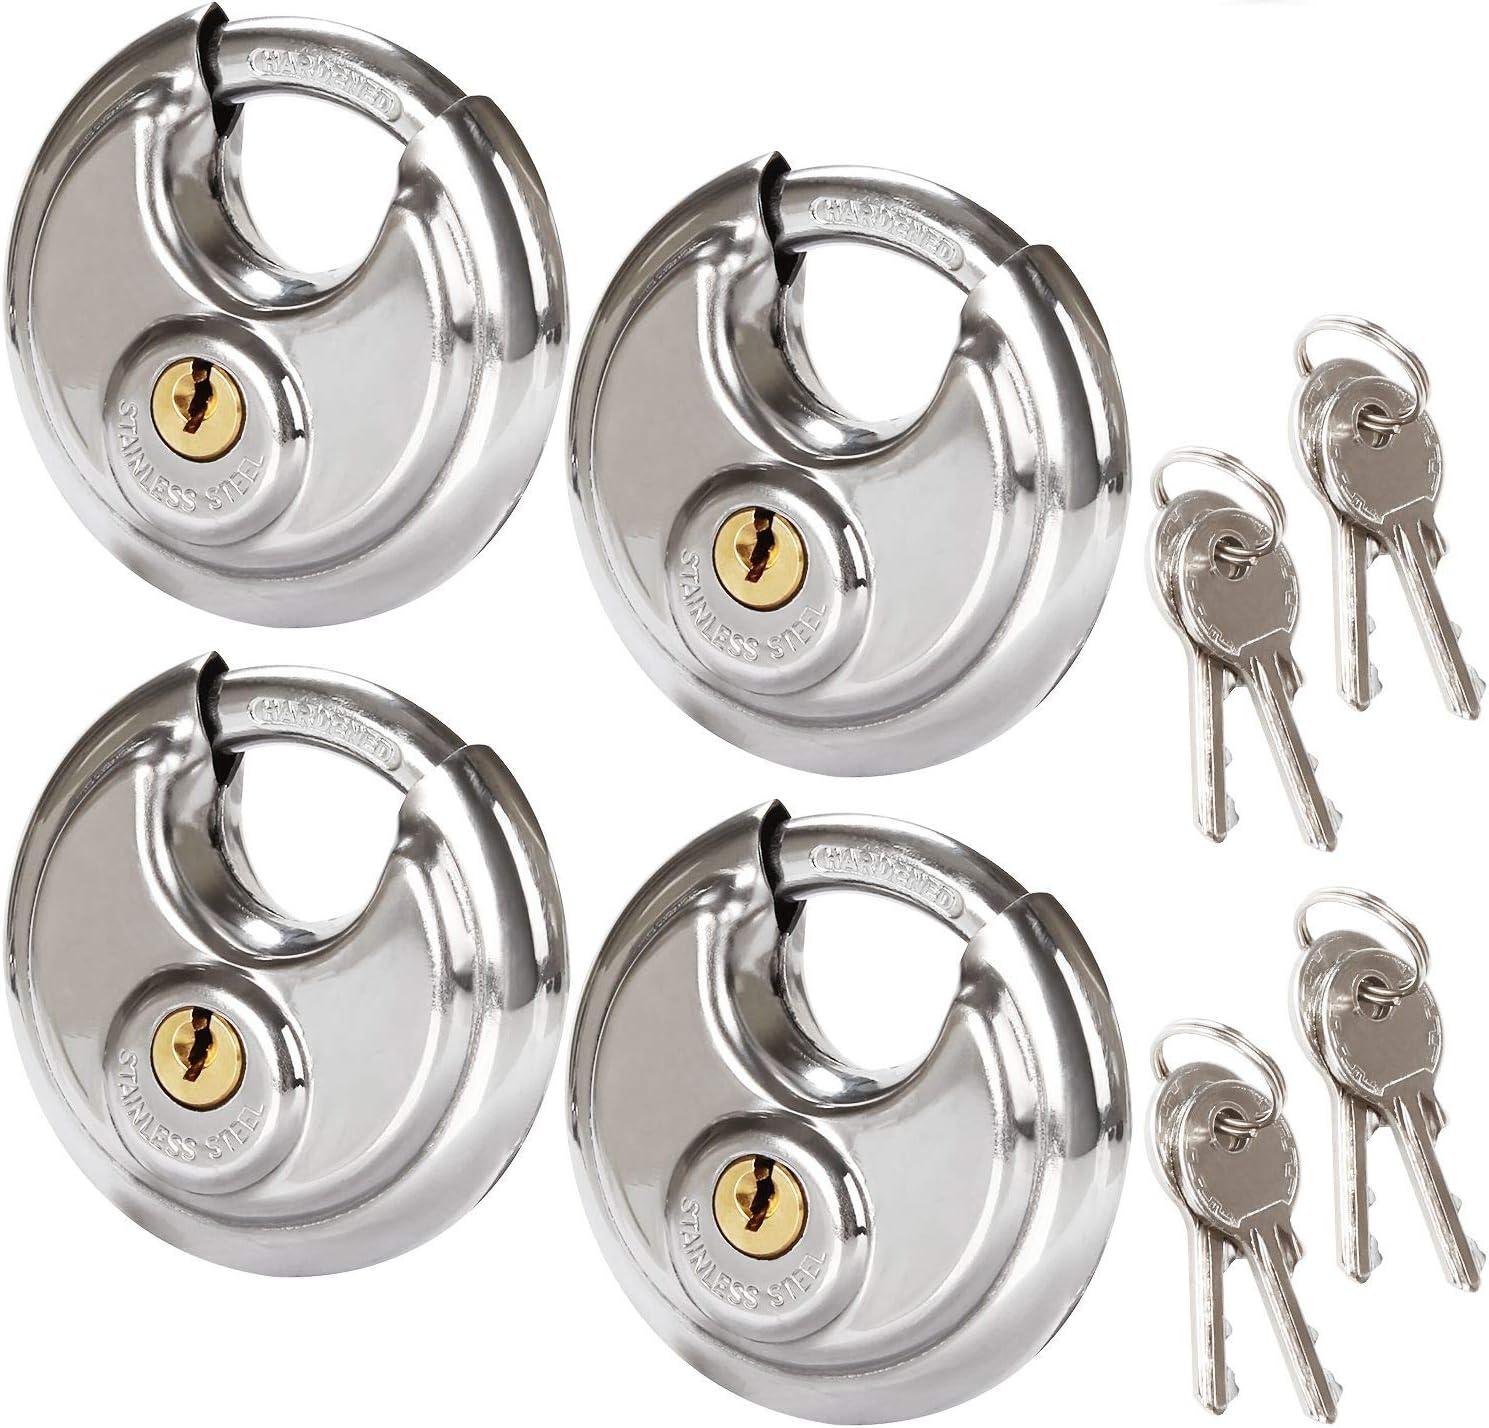 4 Pcs Round Padlock Stainless Steel Arlington Bargain sale Mall Duty Locks Rust Heavy Discus